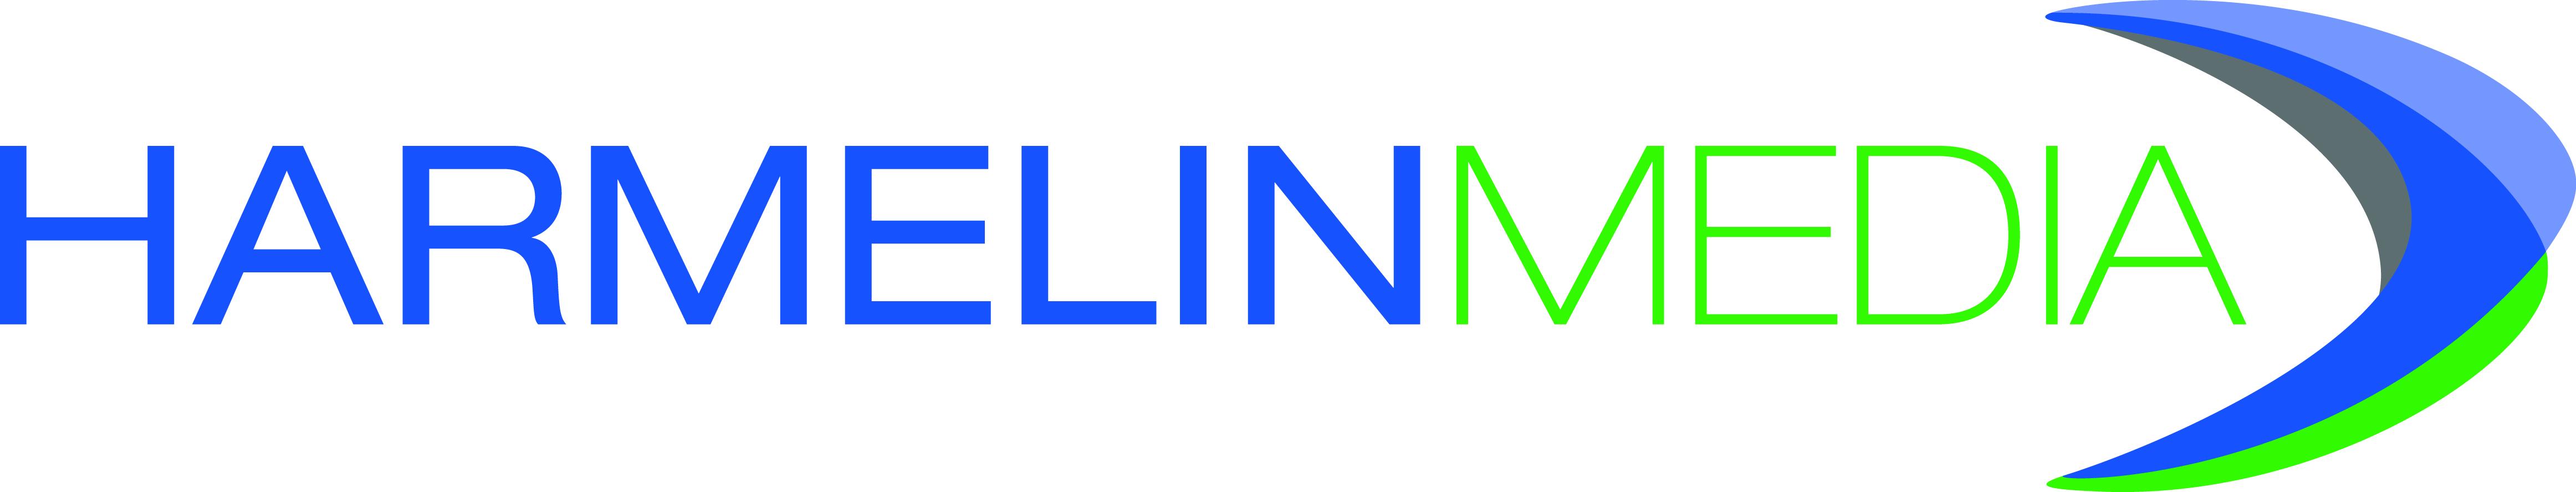 Logo for Harmelin Media